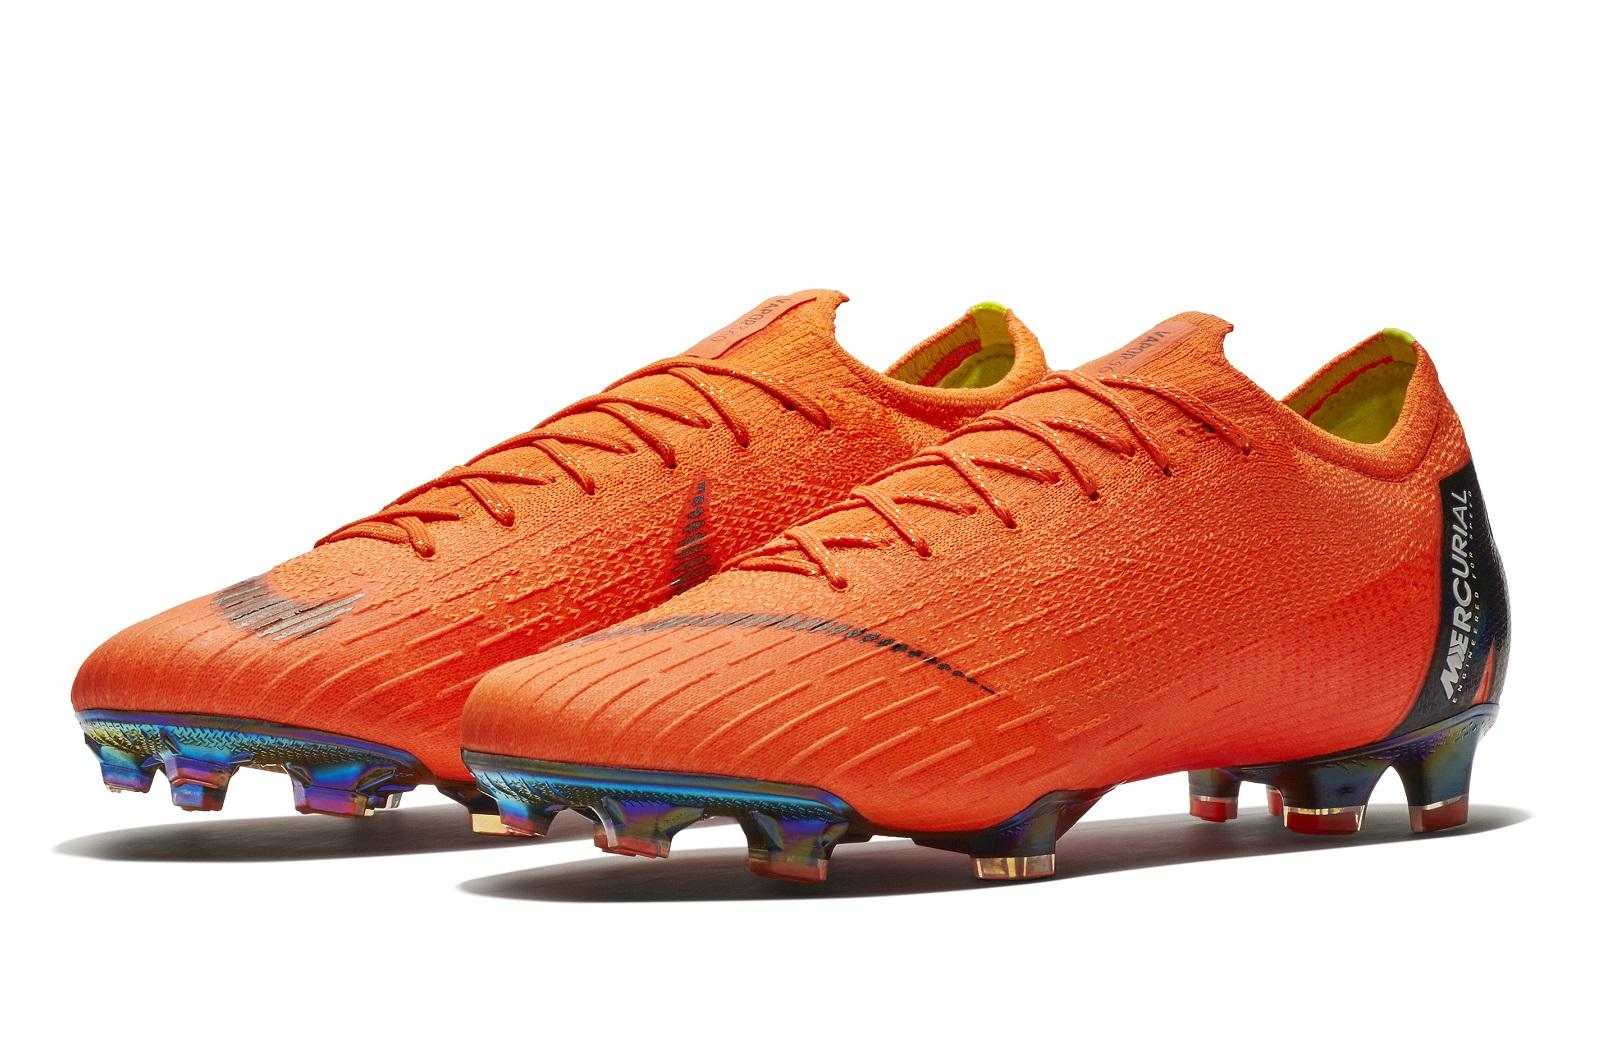 e93a5c822 Nike Mercurial Vapor 360 Elite | Soccer Cleats 101